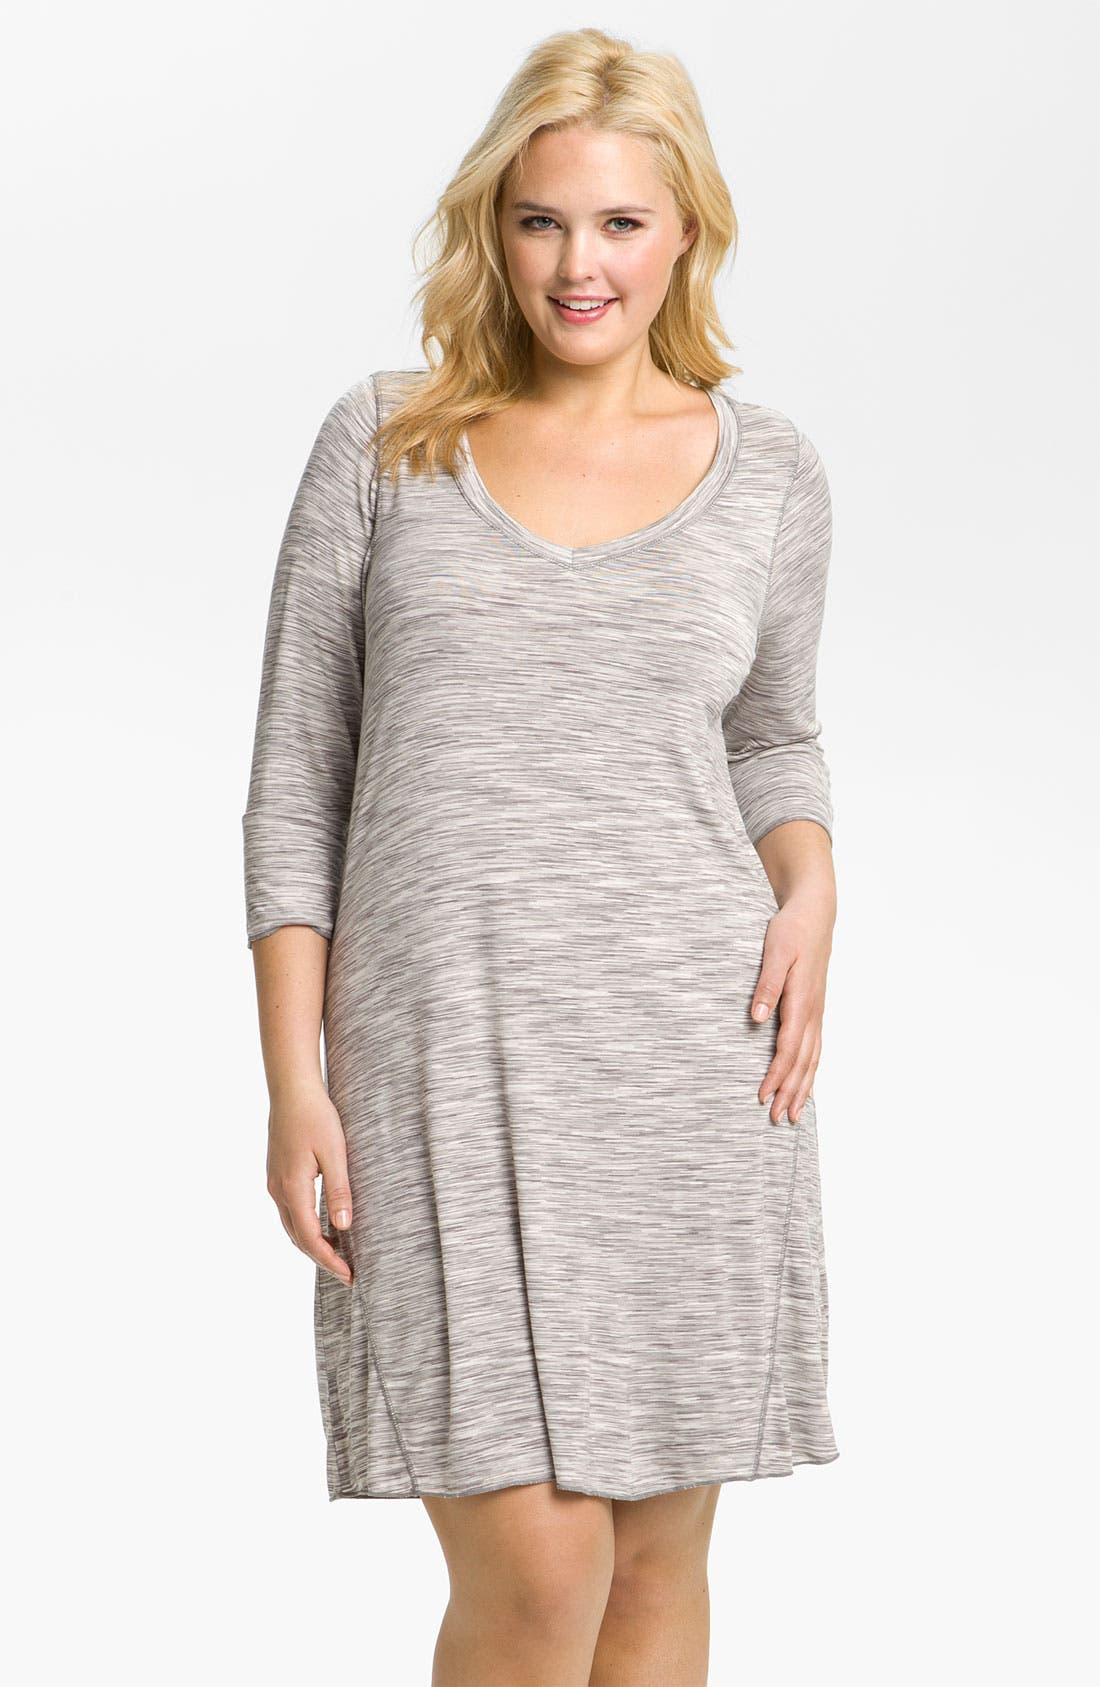 Main Image - Hue Space Dye Sleep Shirt (Plus)